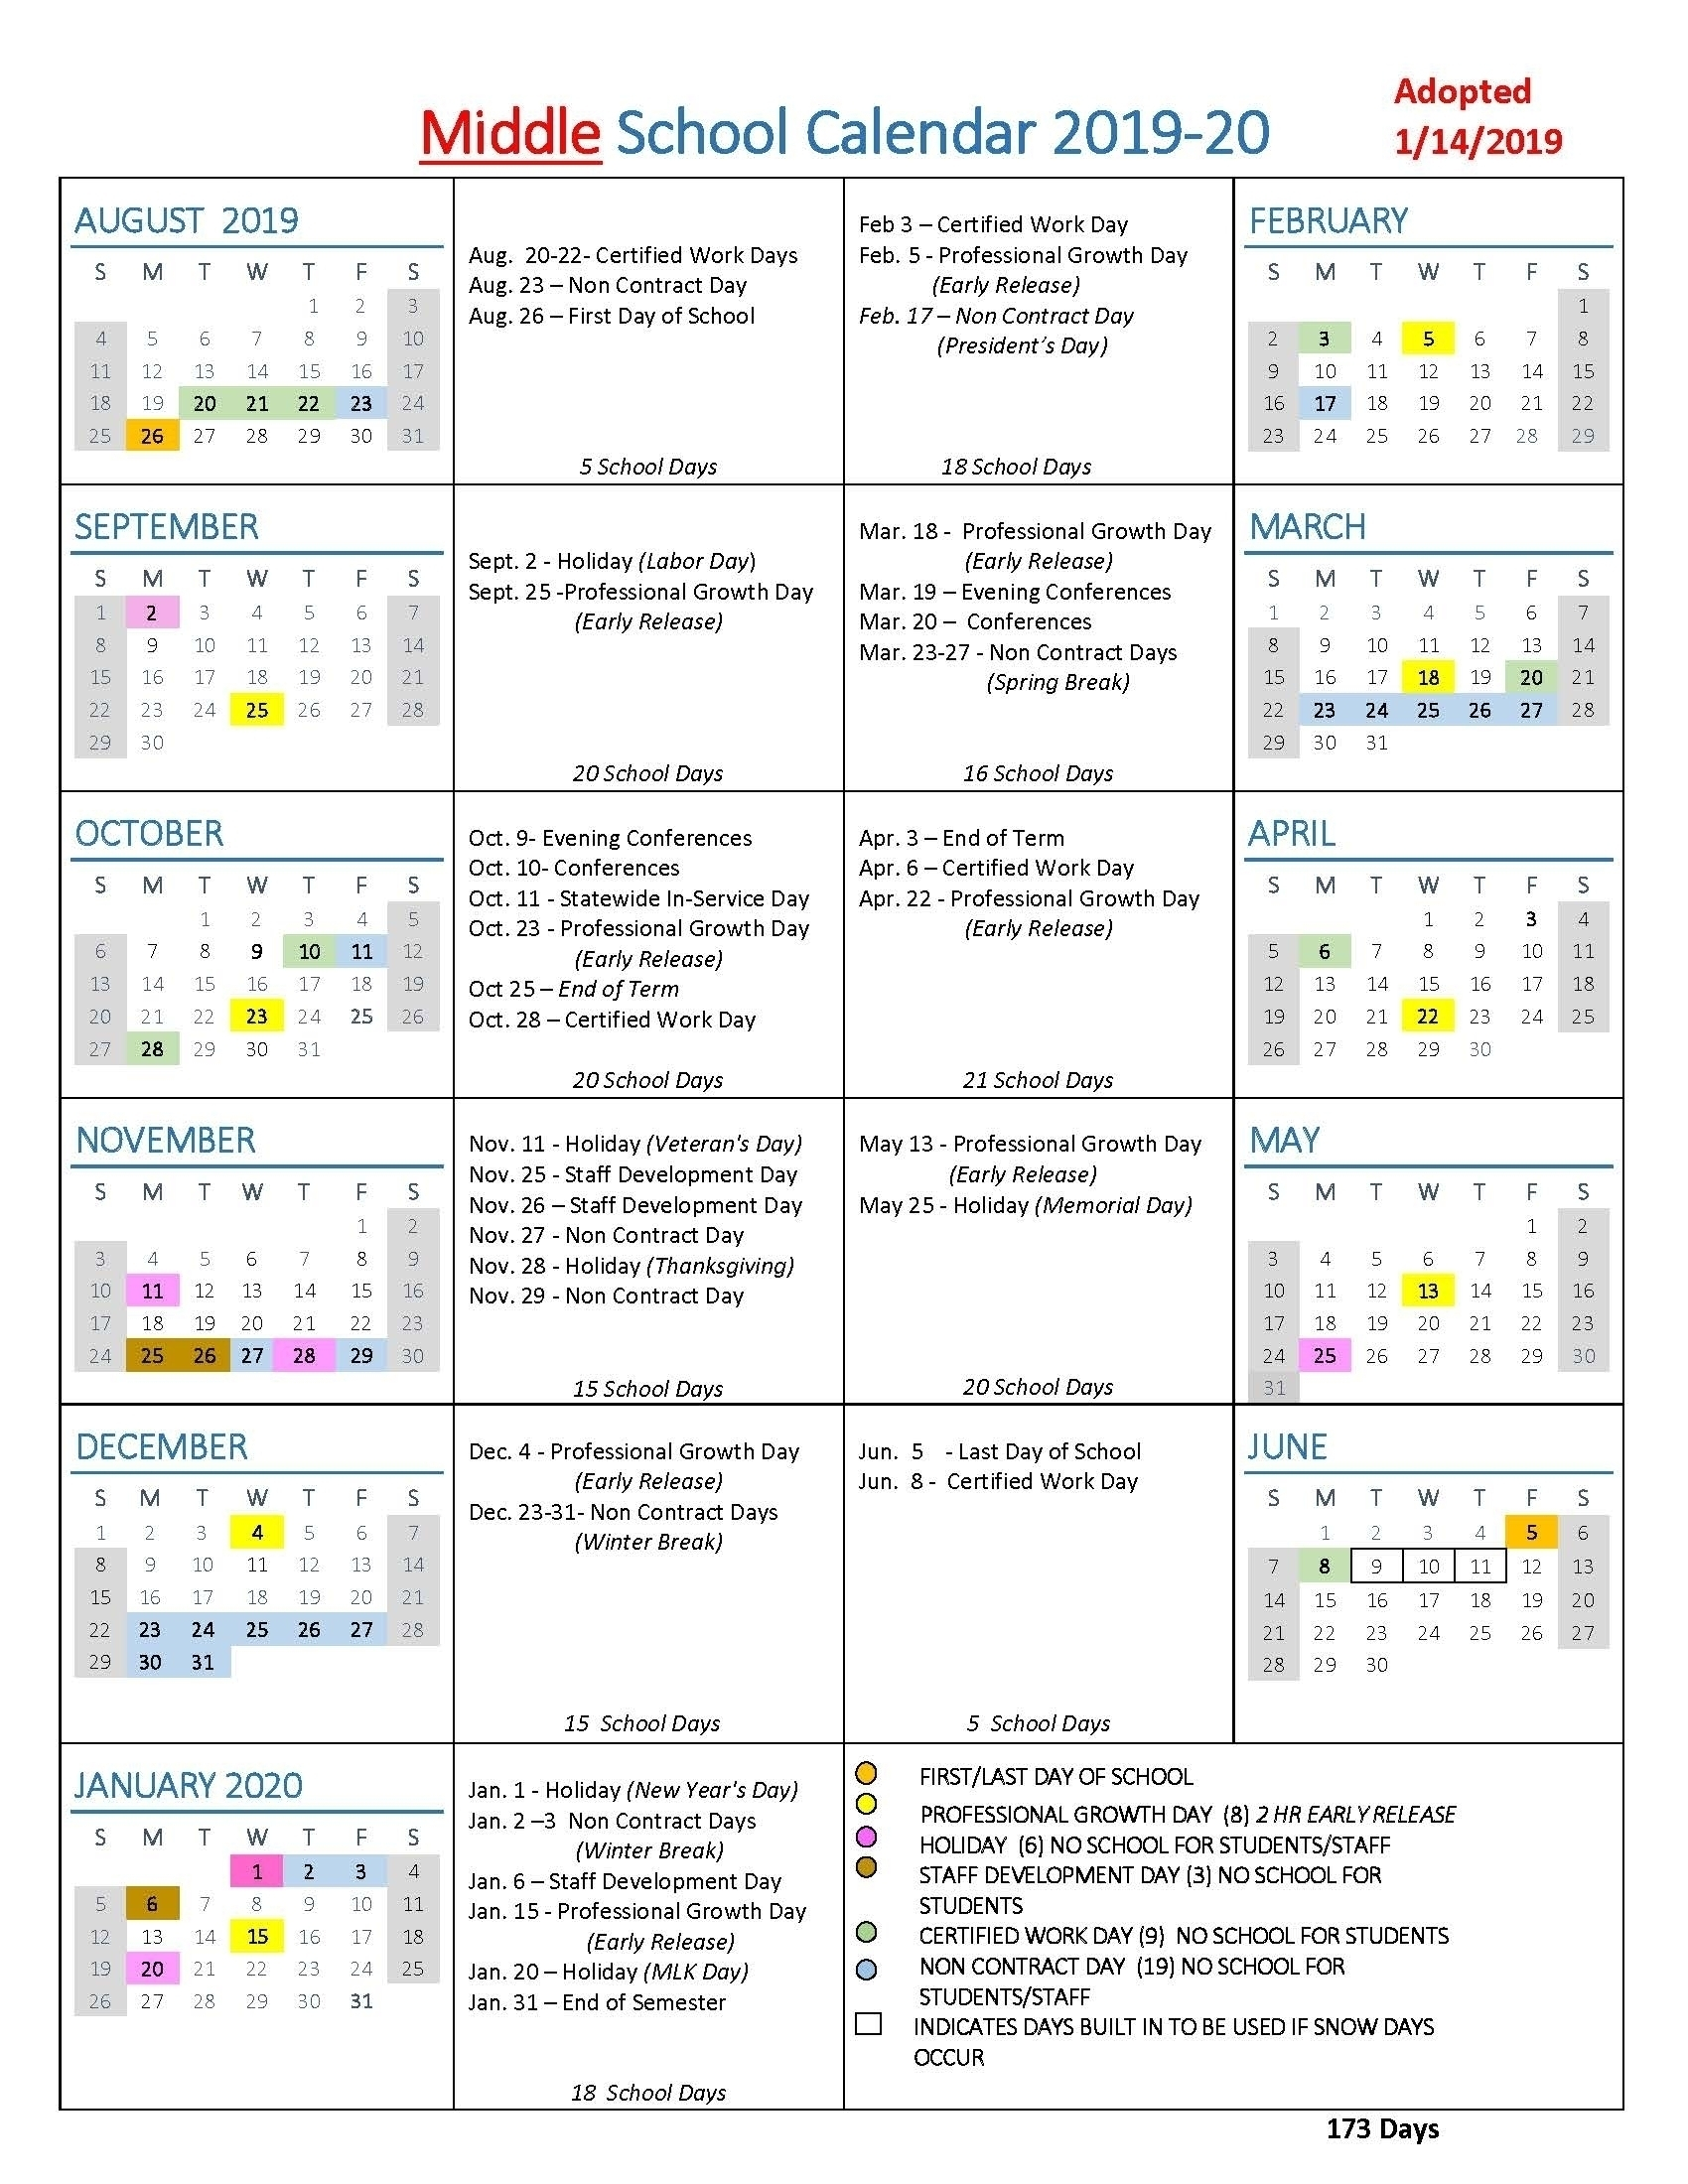 Special Days In 2020 Calendar - Calendar Inspiration Design throughout 2020 Calendar Of Special Days